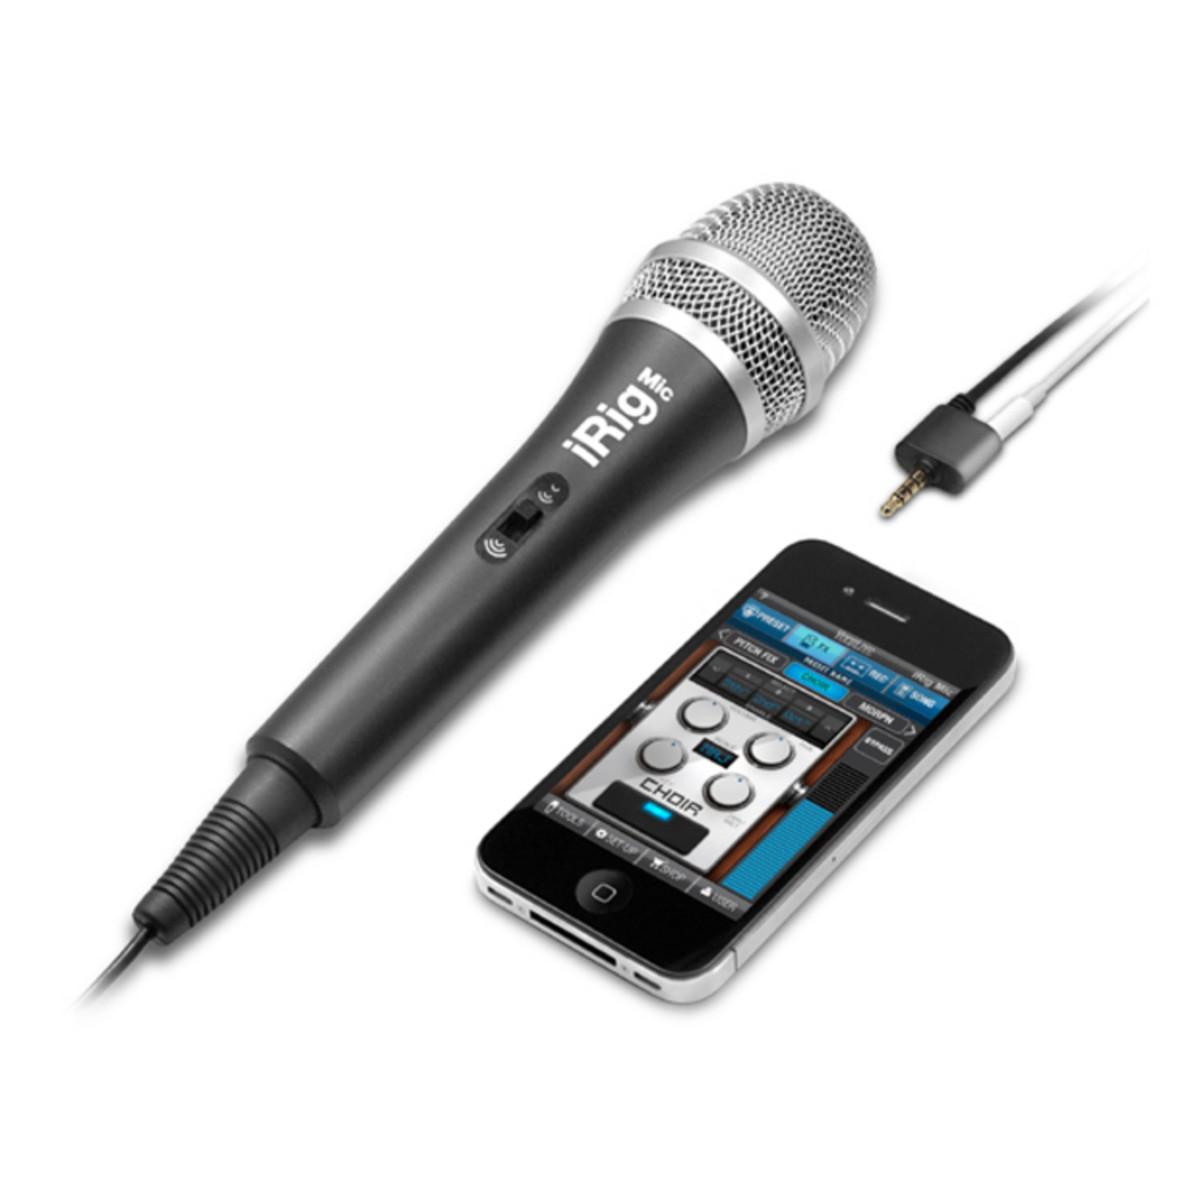 IK Multimedia iRig Mic Microphone for iPhone